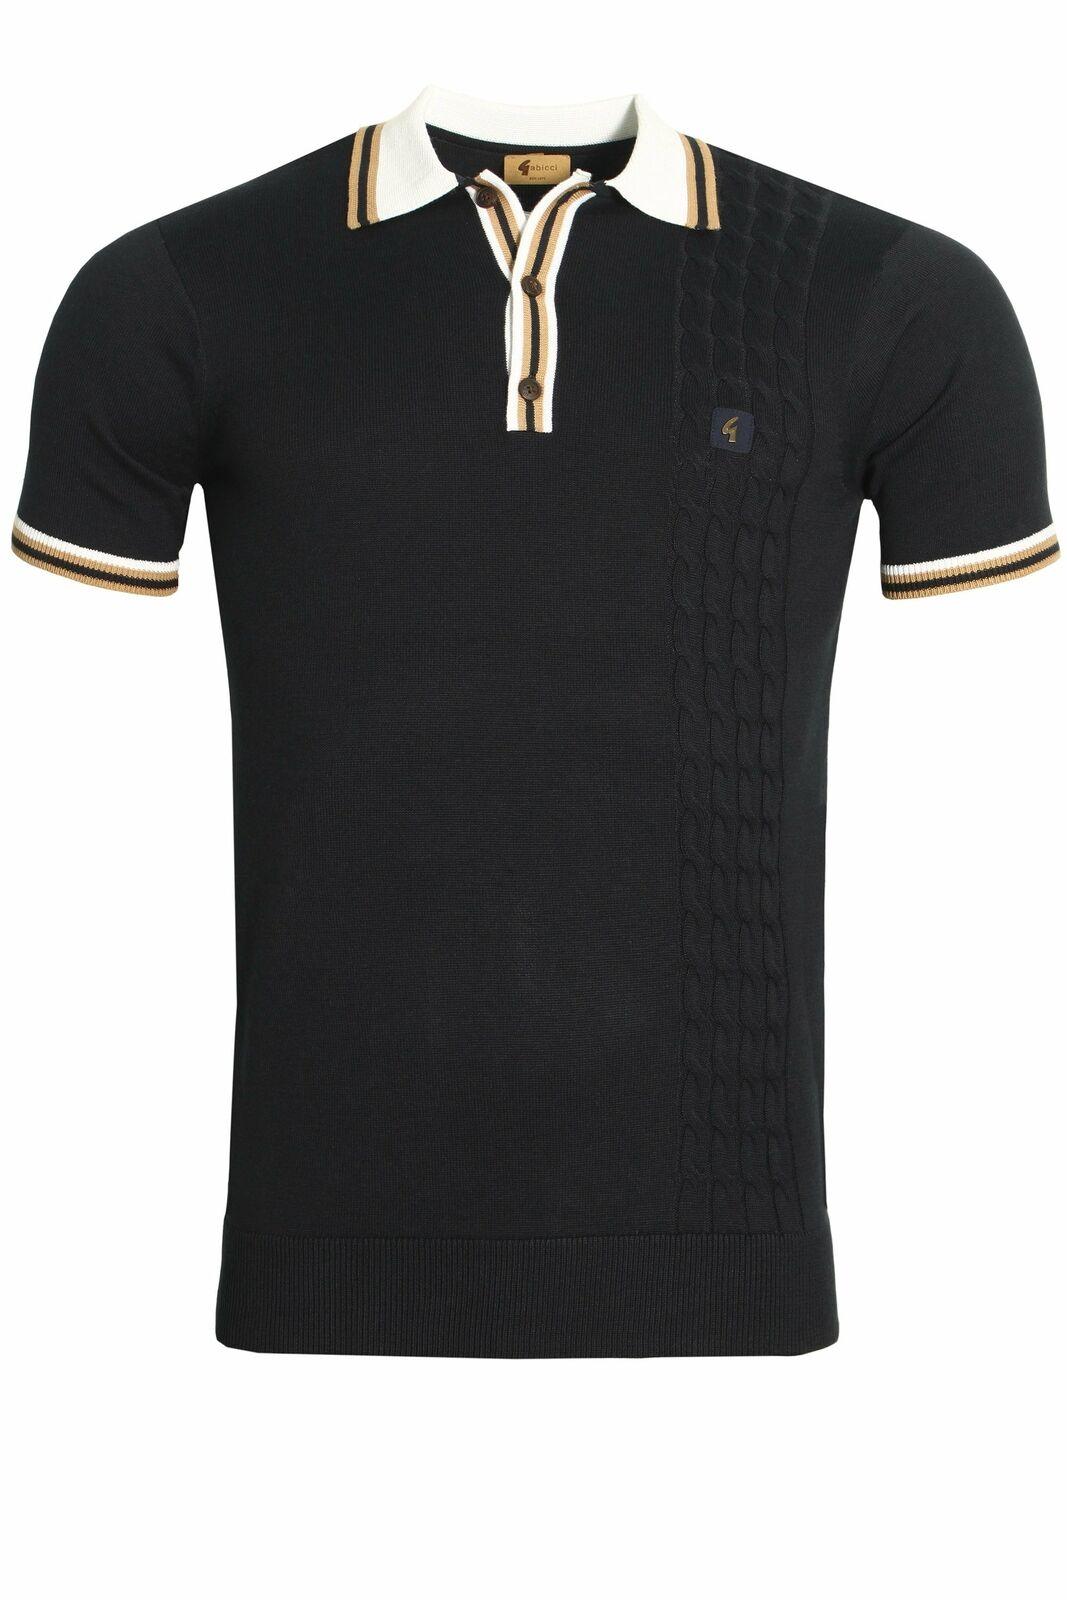 Mens Polo Shirt GABICCI Croxted 3 Button Mens Polo Shirt   Navy